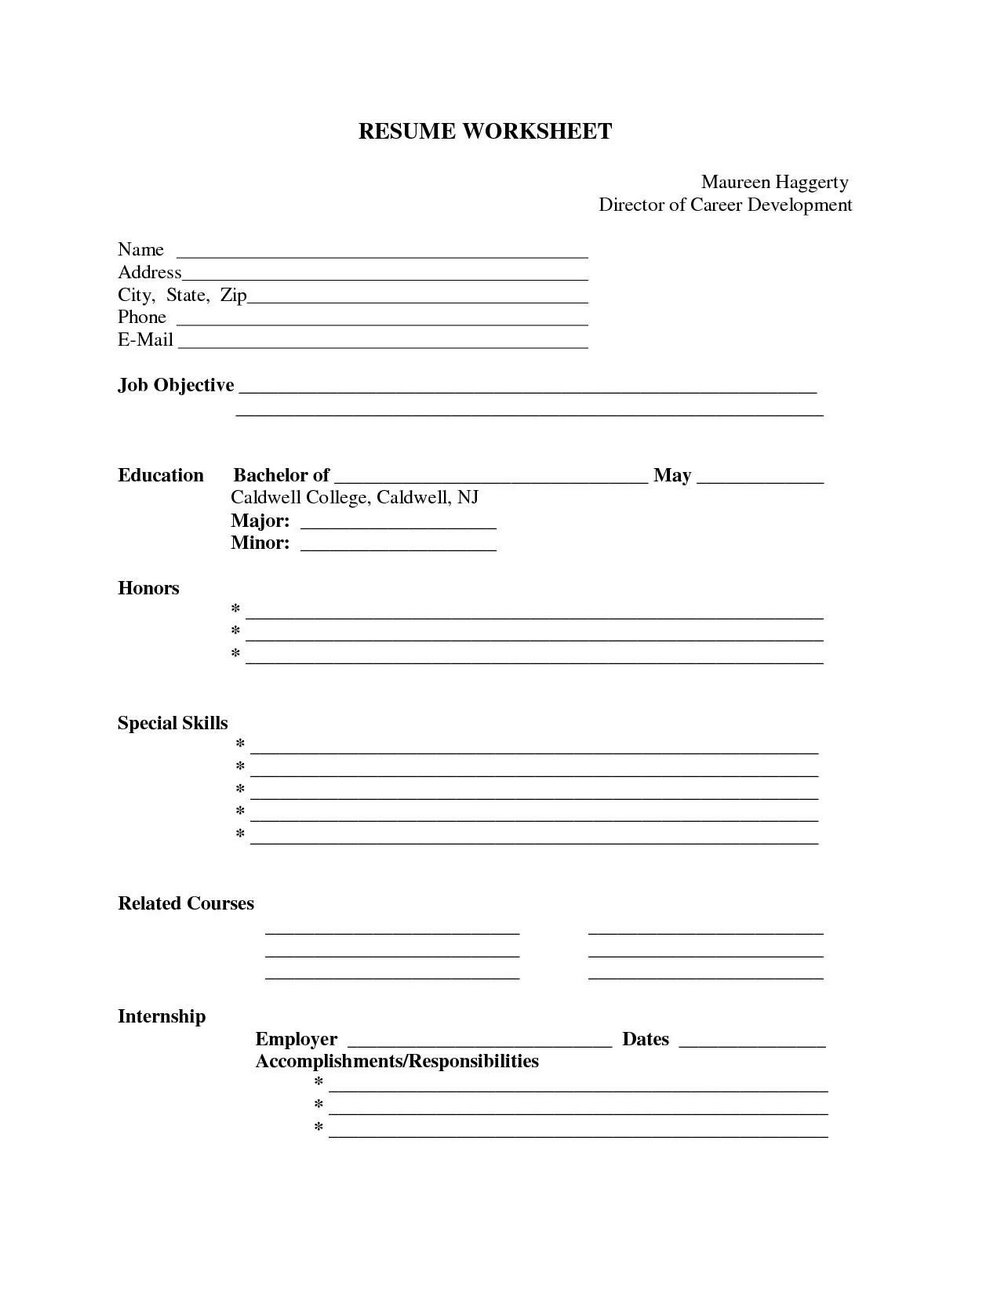 Print Free Resume Now